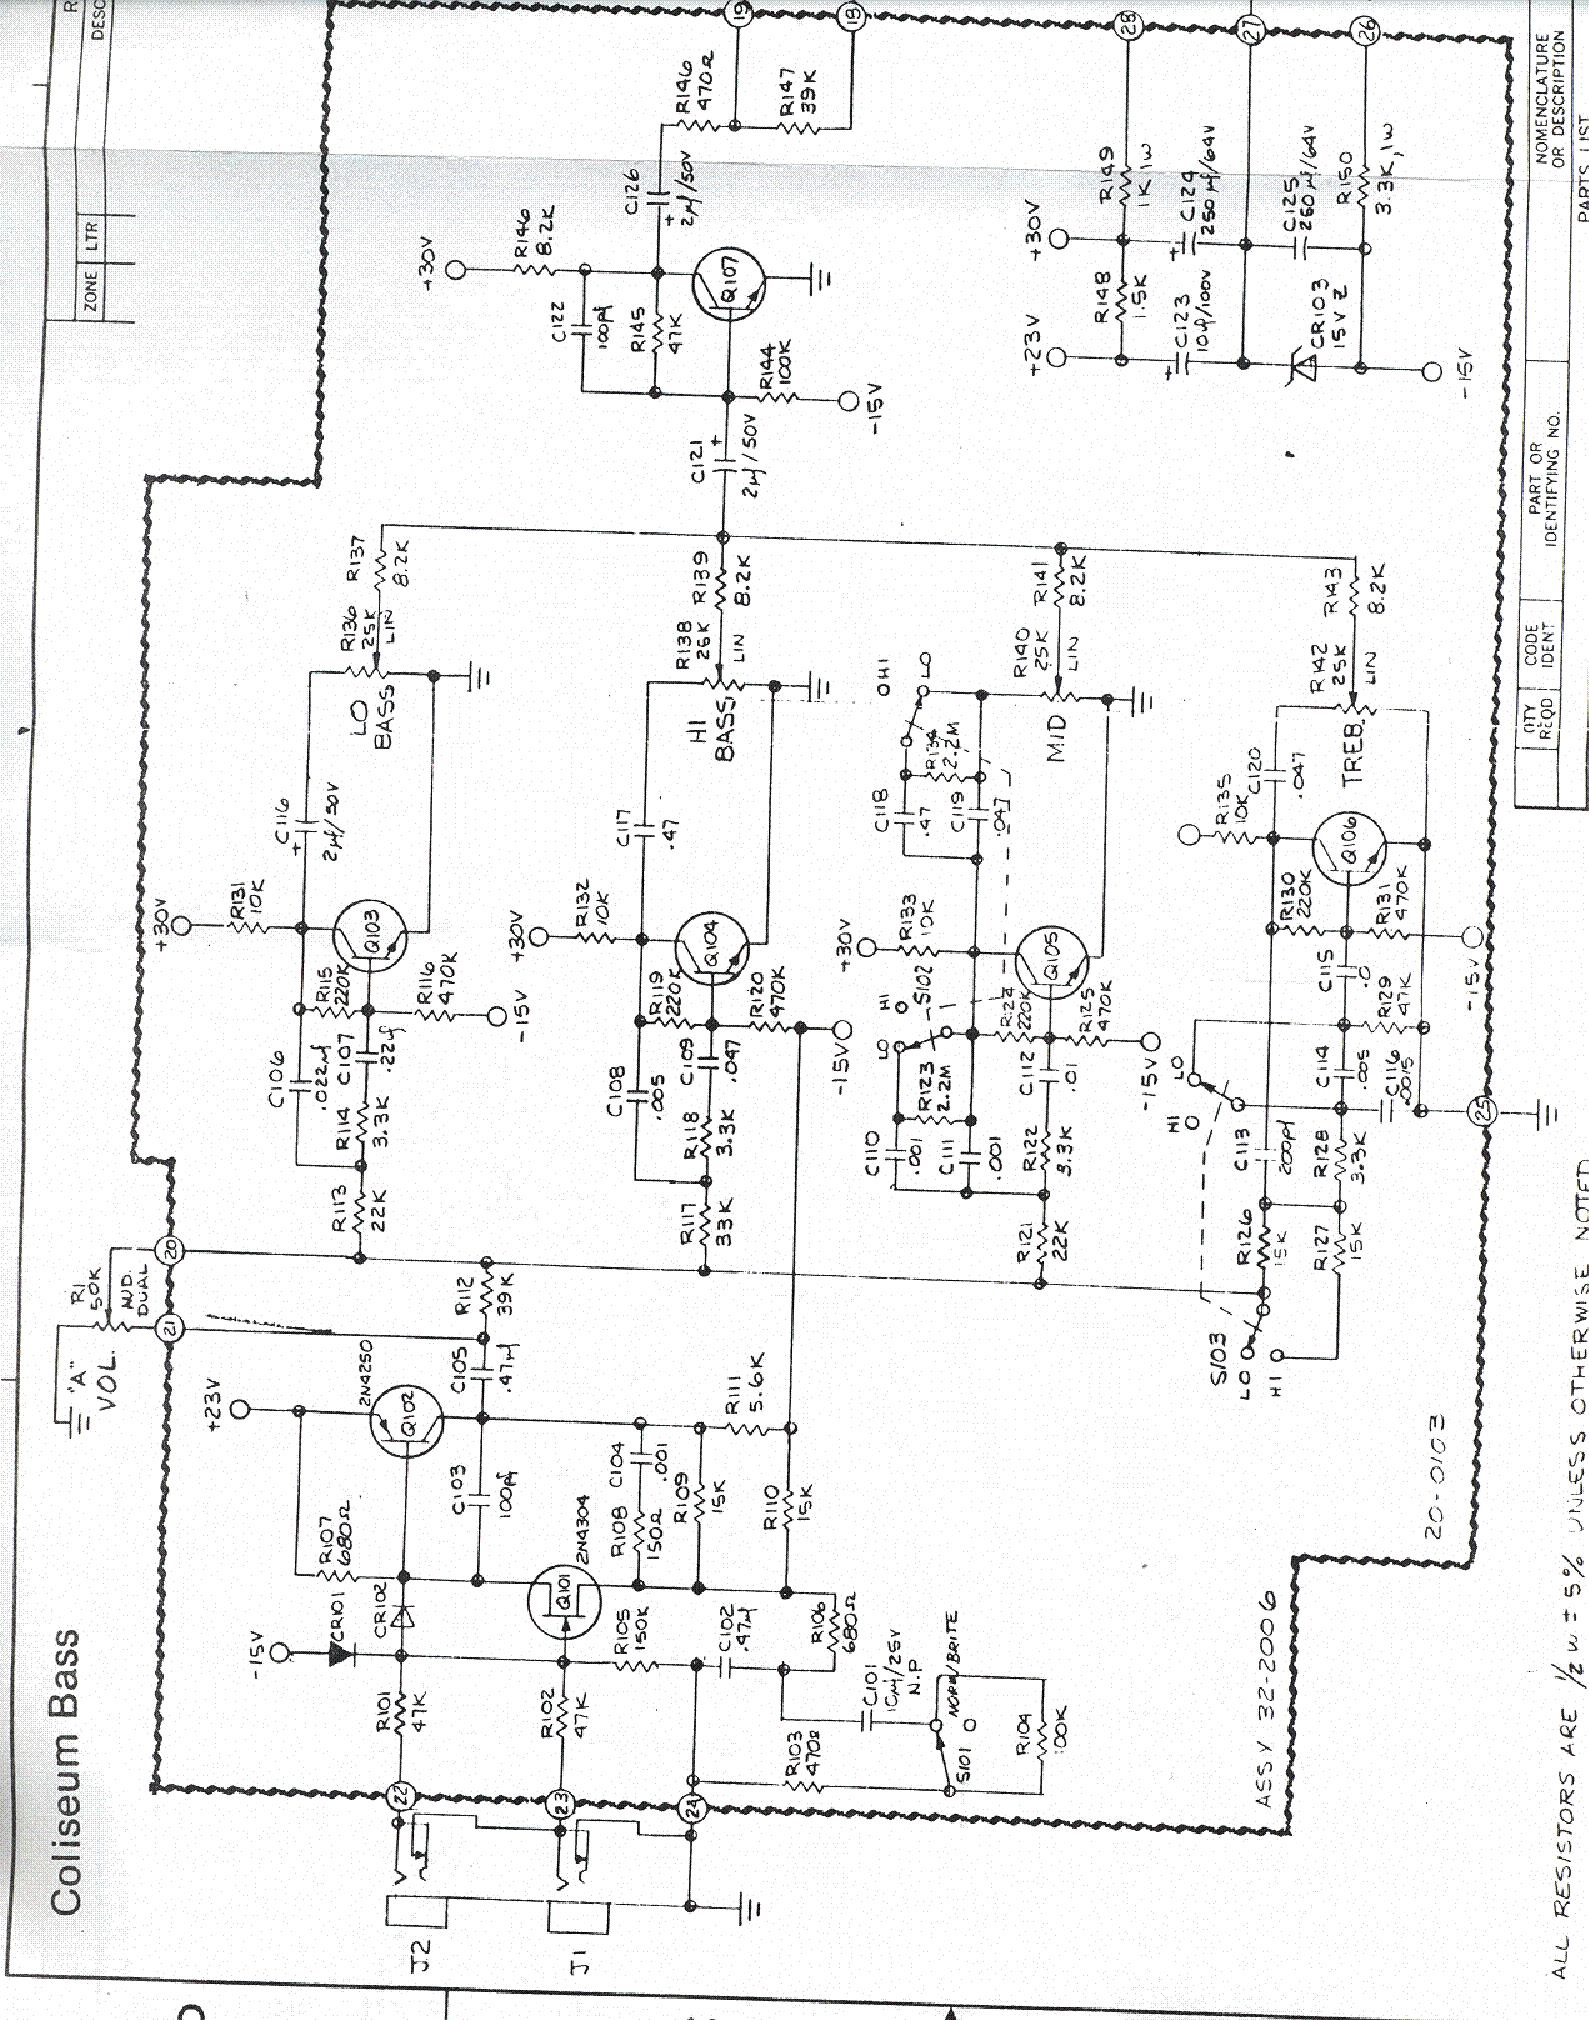 sunn sonic i40 sch service manual download  schematics